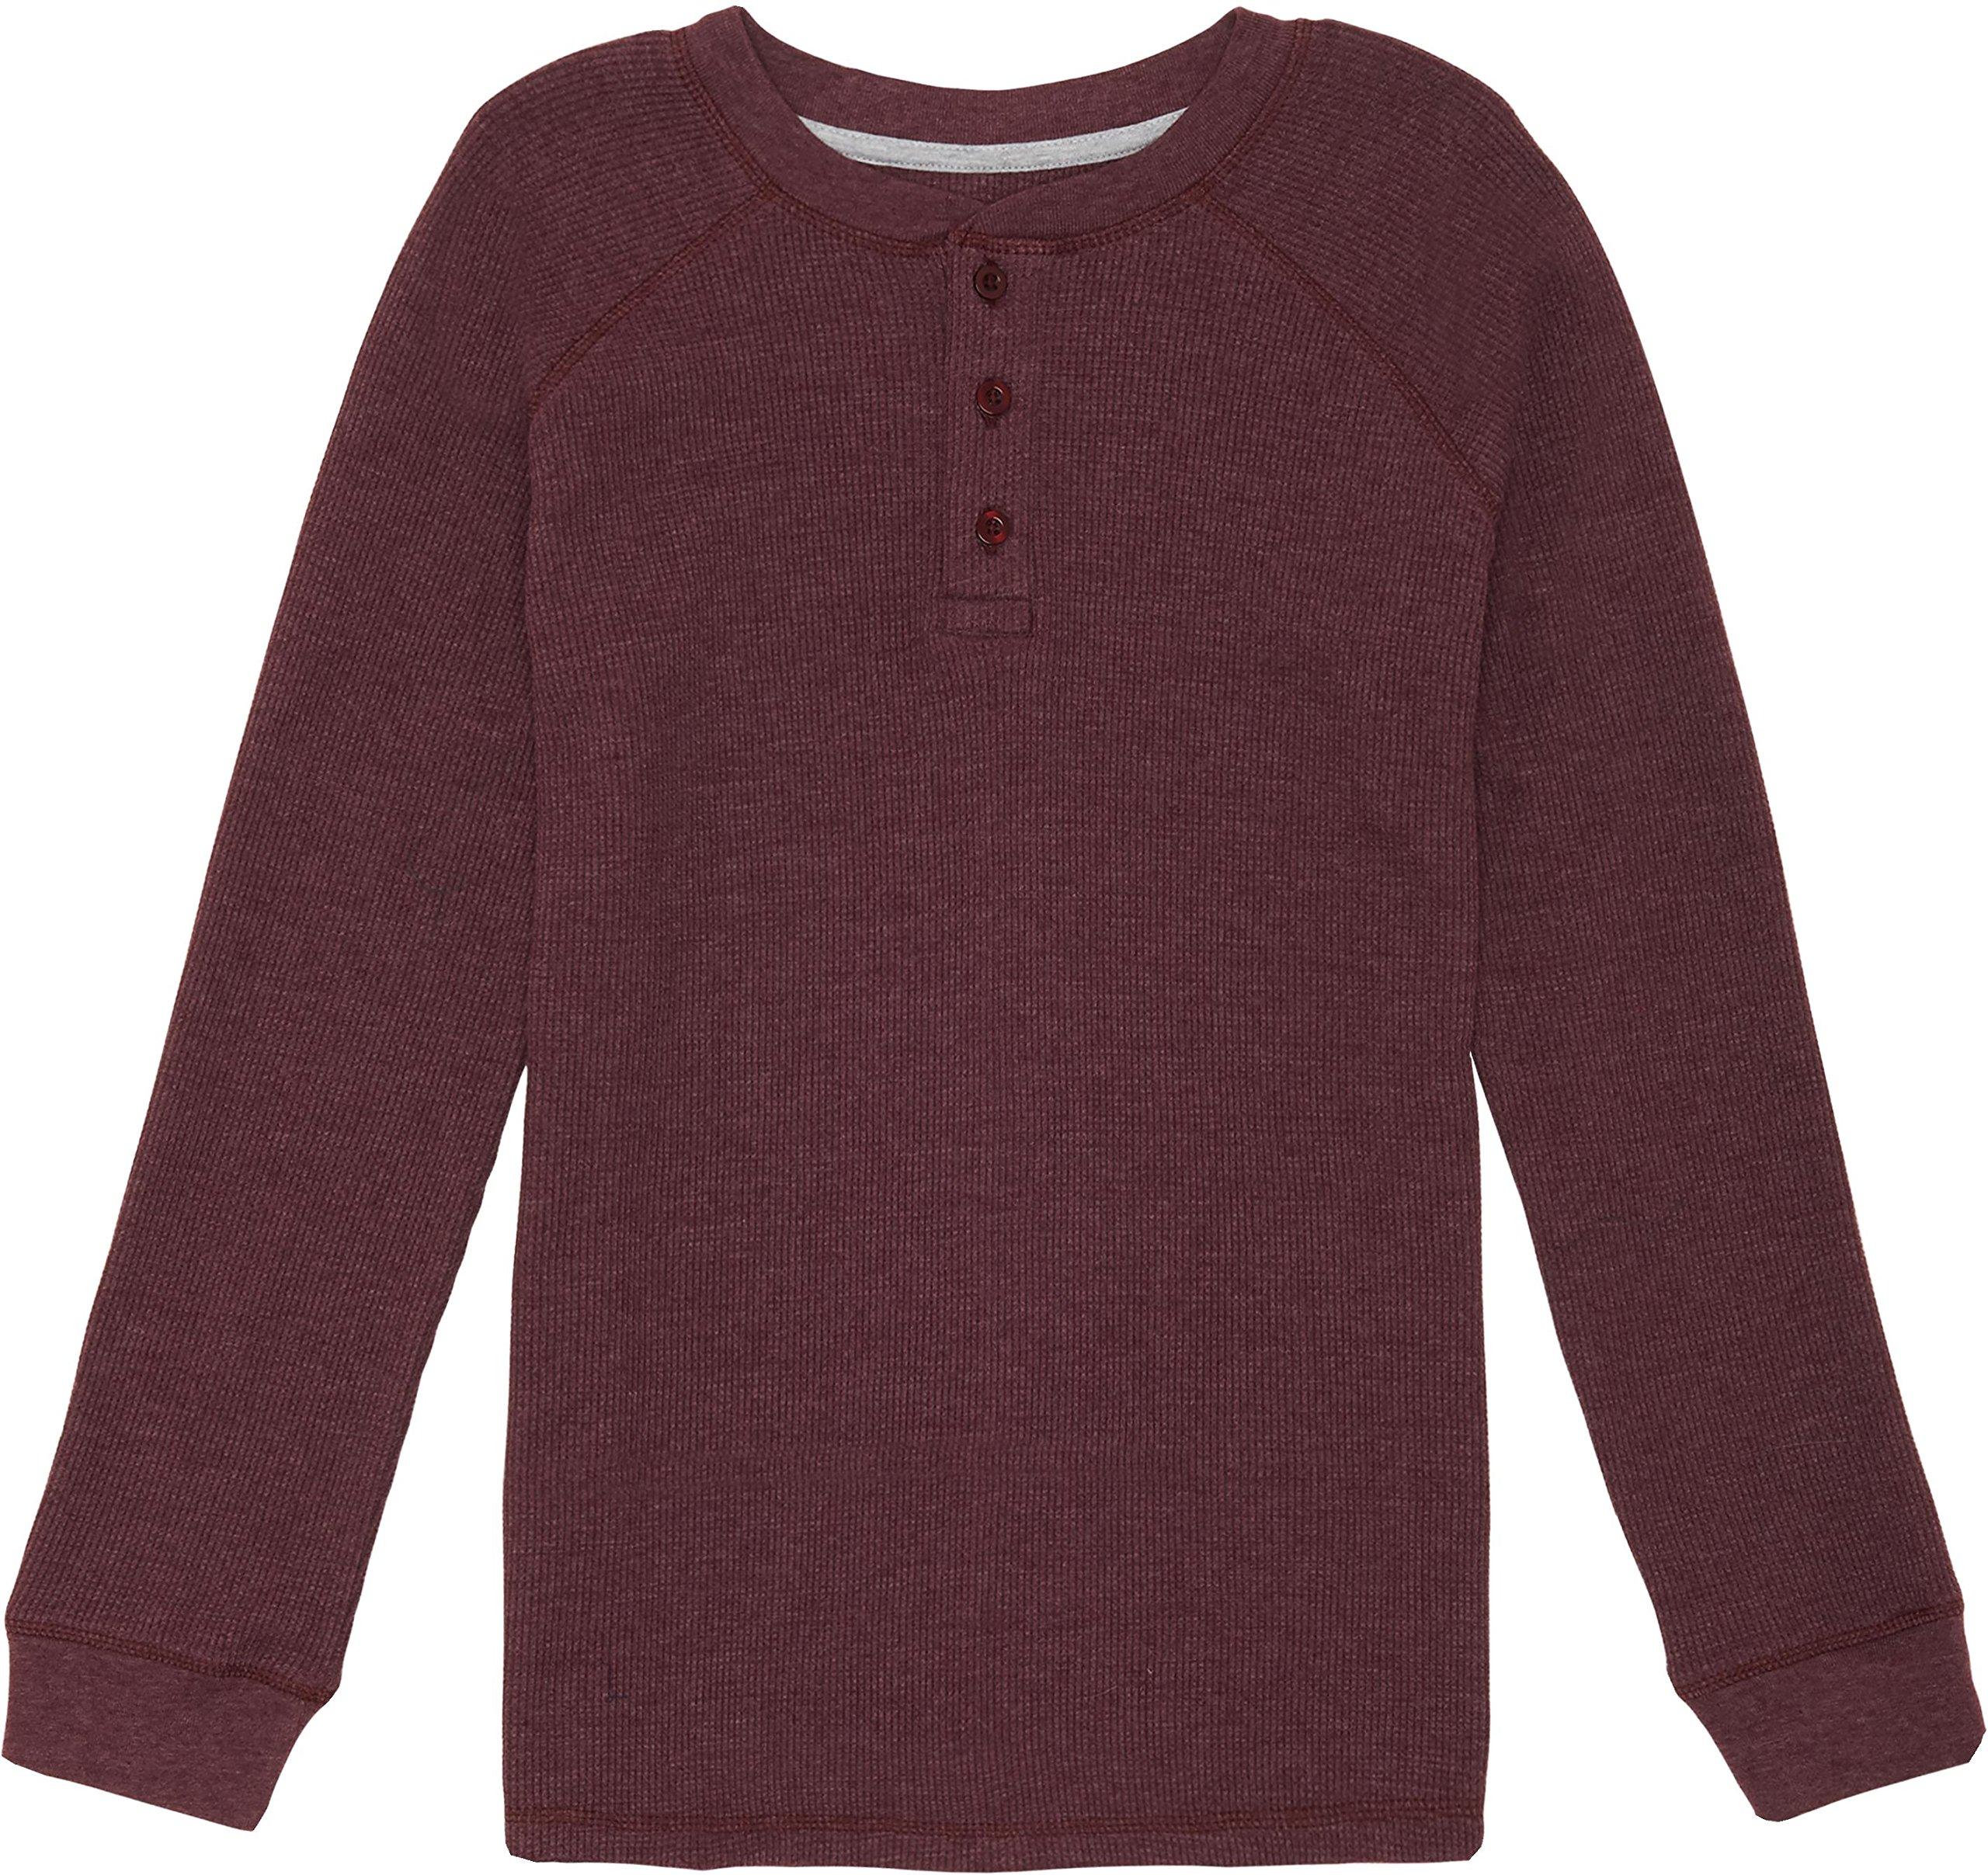 French Toast School Uniform Boys Long Sleeve Thermal Raglan Henley T-Shirt, Berry Bark Heather, 6